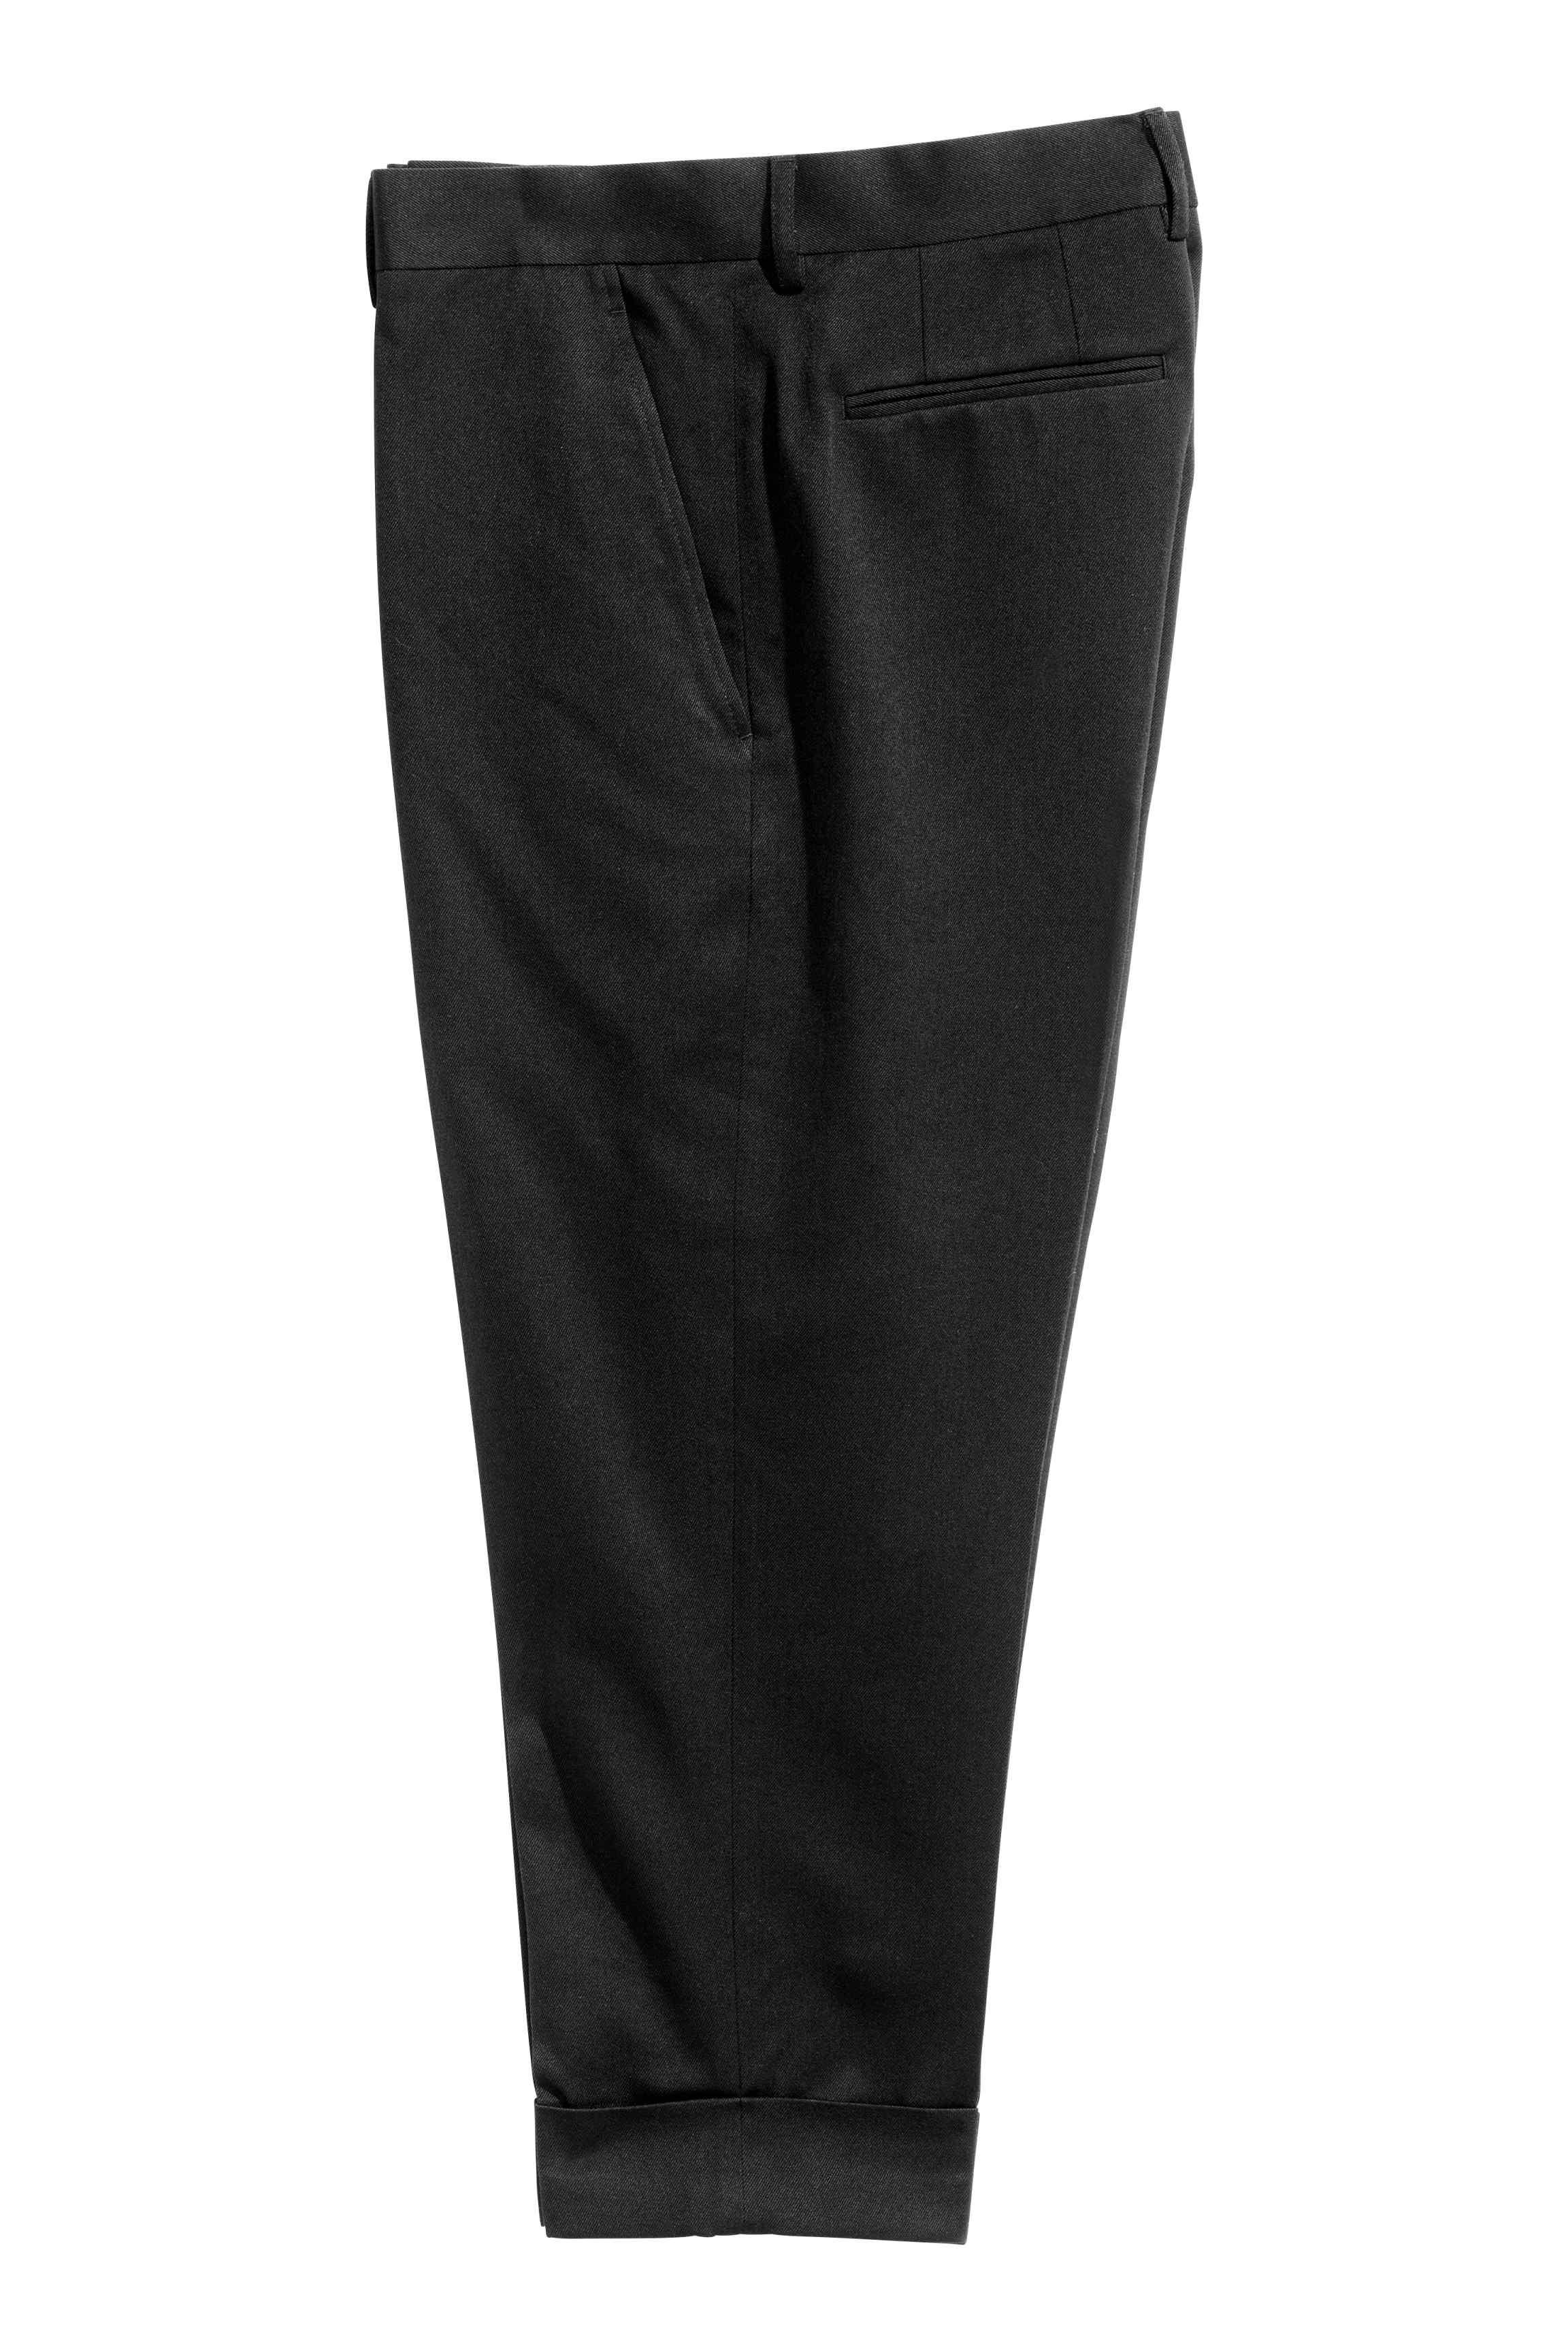 Suit twill trousers, £24.99 ( hm.com )